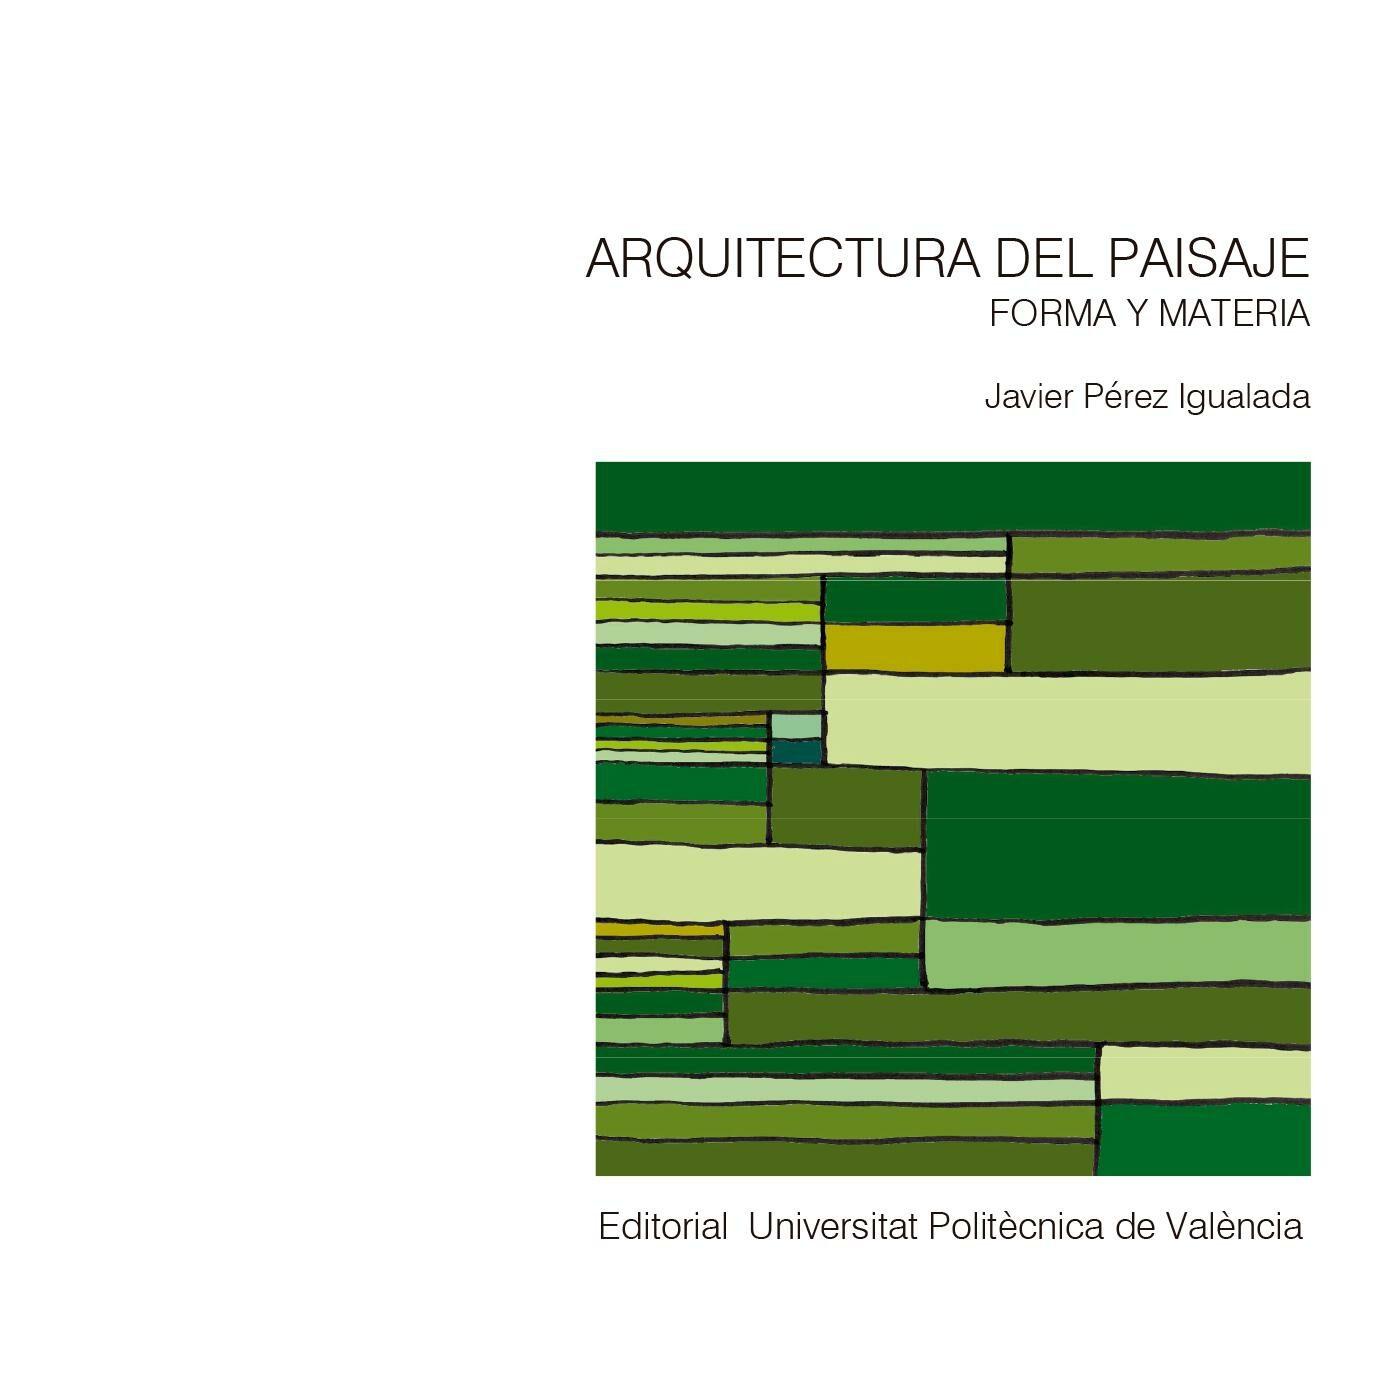 ARQUITECTURA DEL PAISAJE. FORMA Y MATERIA EBOOK | JAVIER PEREZ ...